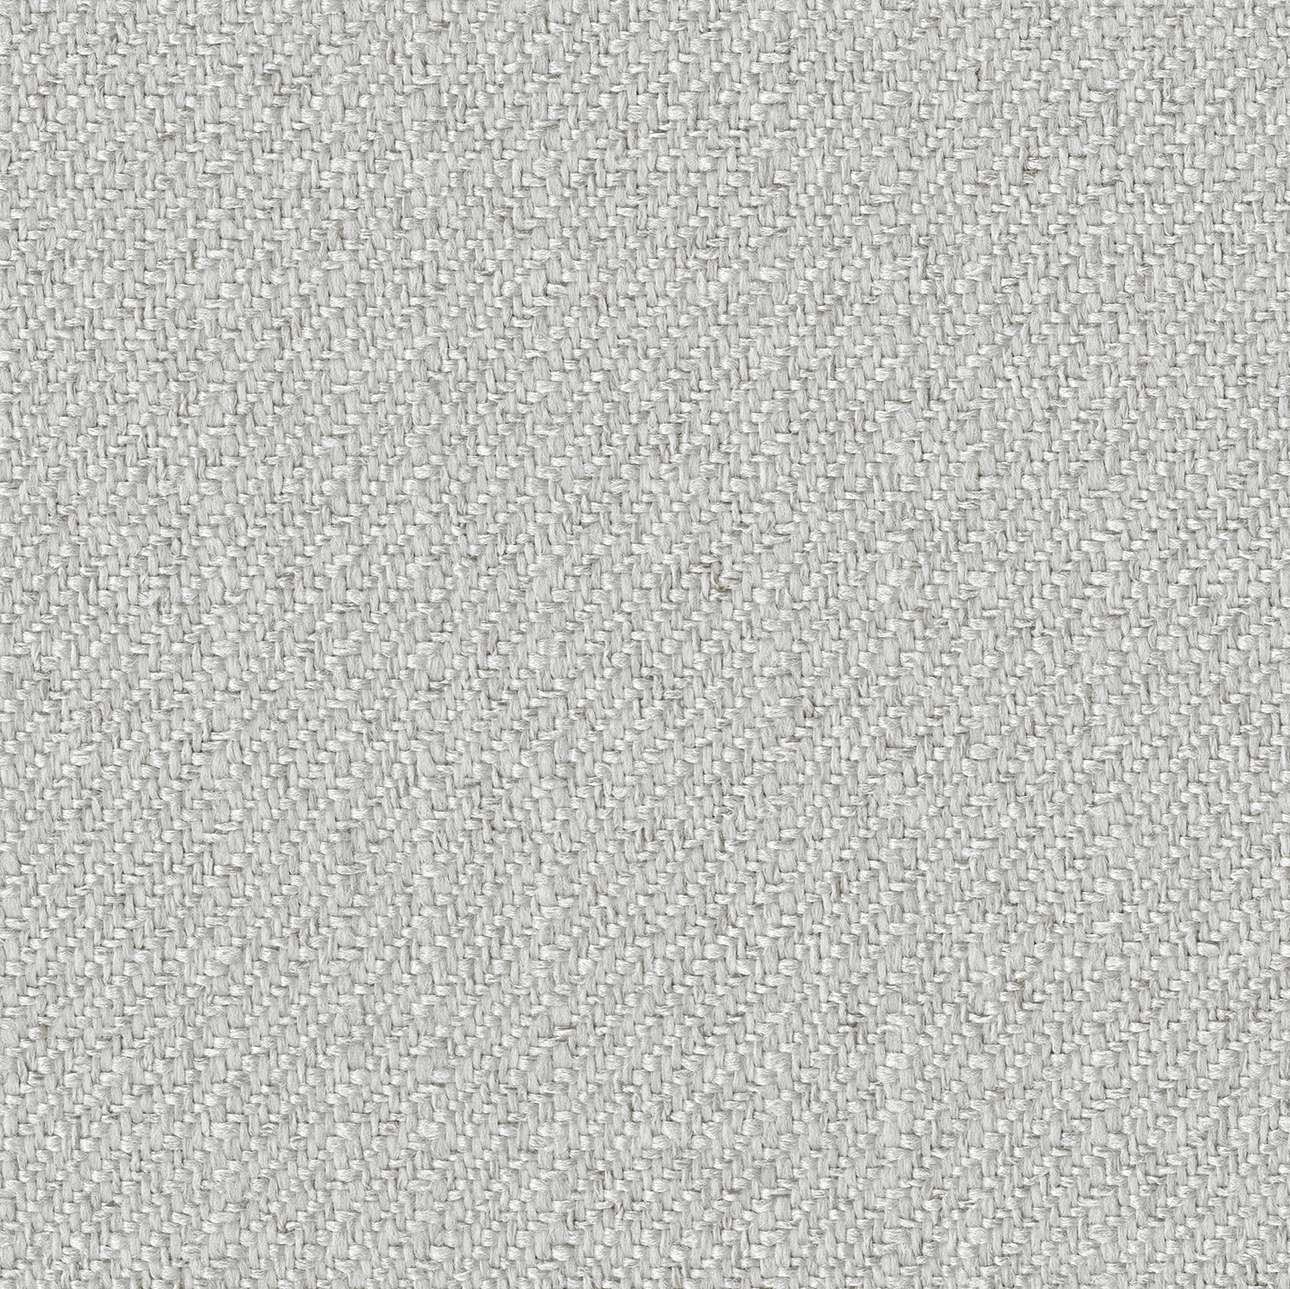 Ekeskog betræk sovesofa fra kollektionen Living 2, Stof: 161-18